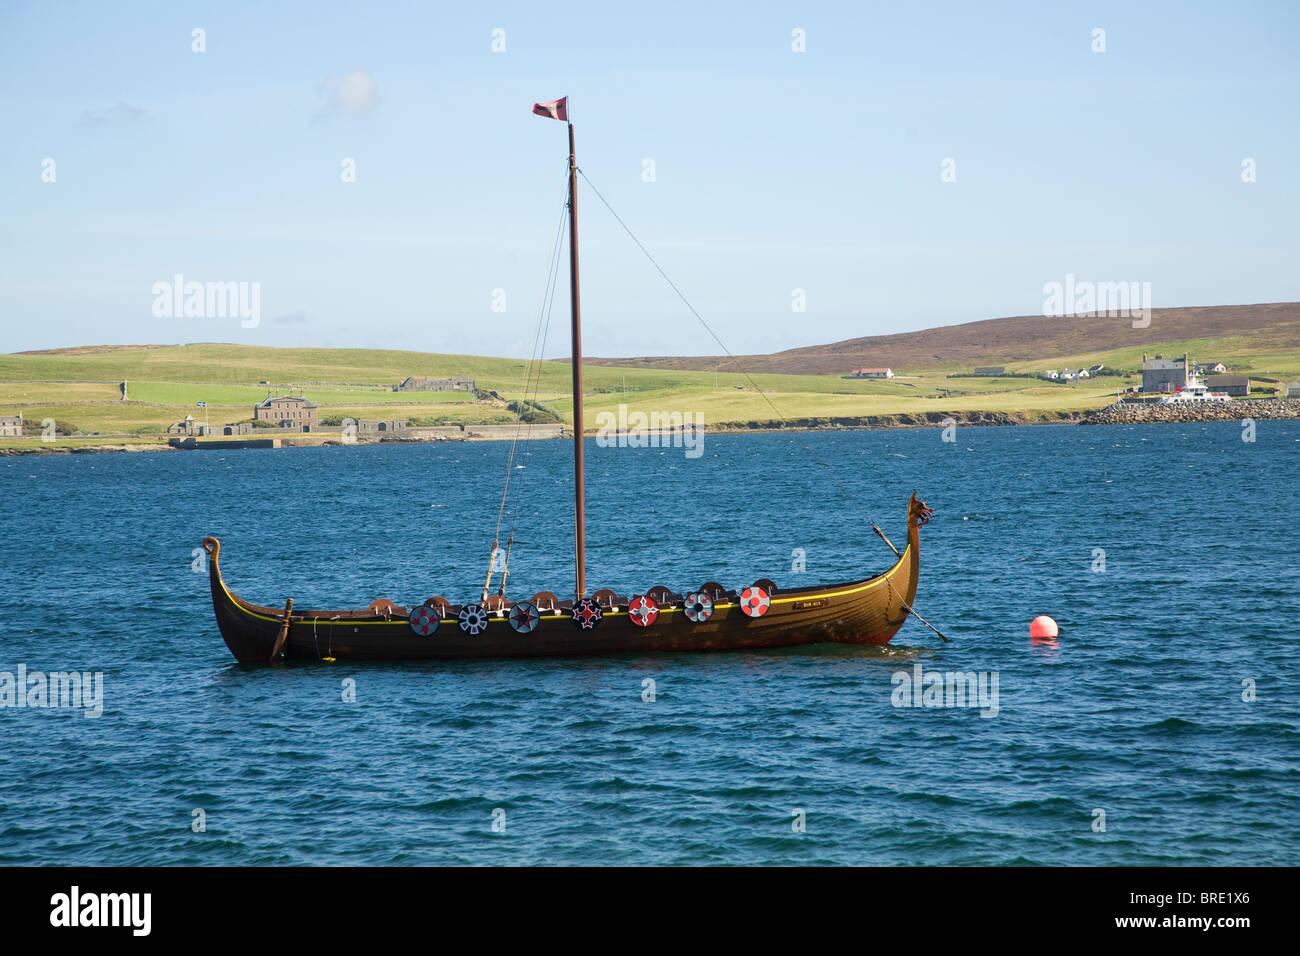 Viking longboat in Bressay Sound, Lerwick, Shetland Islands, Scotland - Stock Image